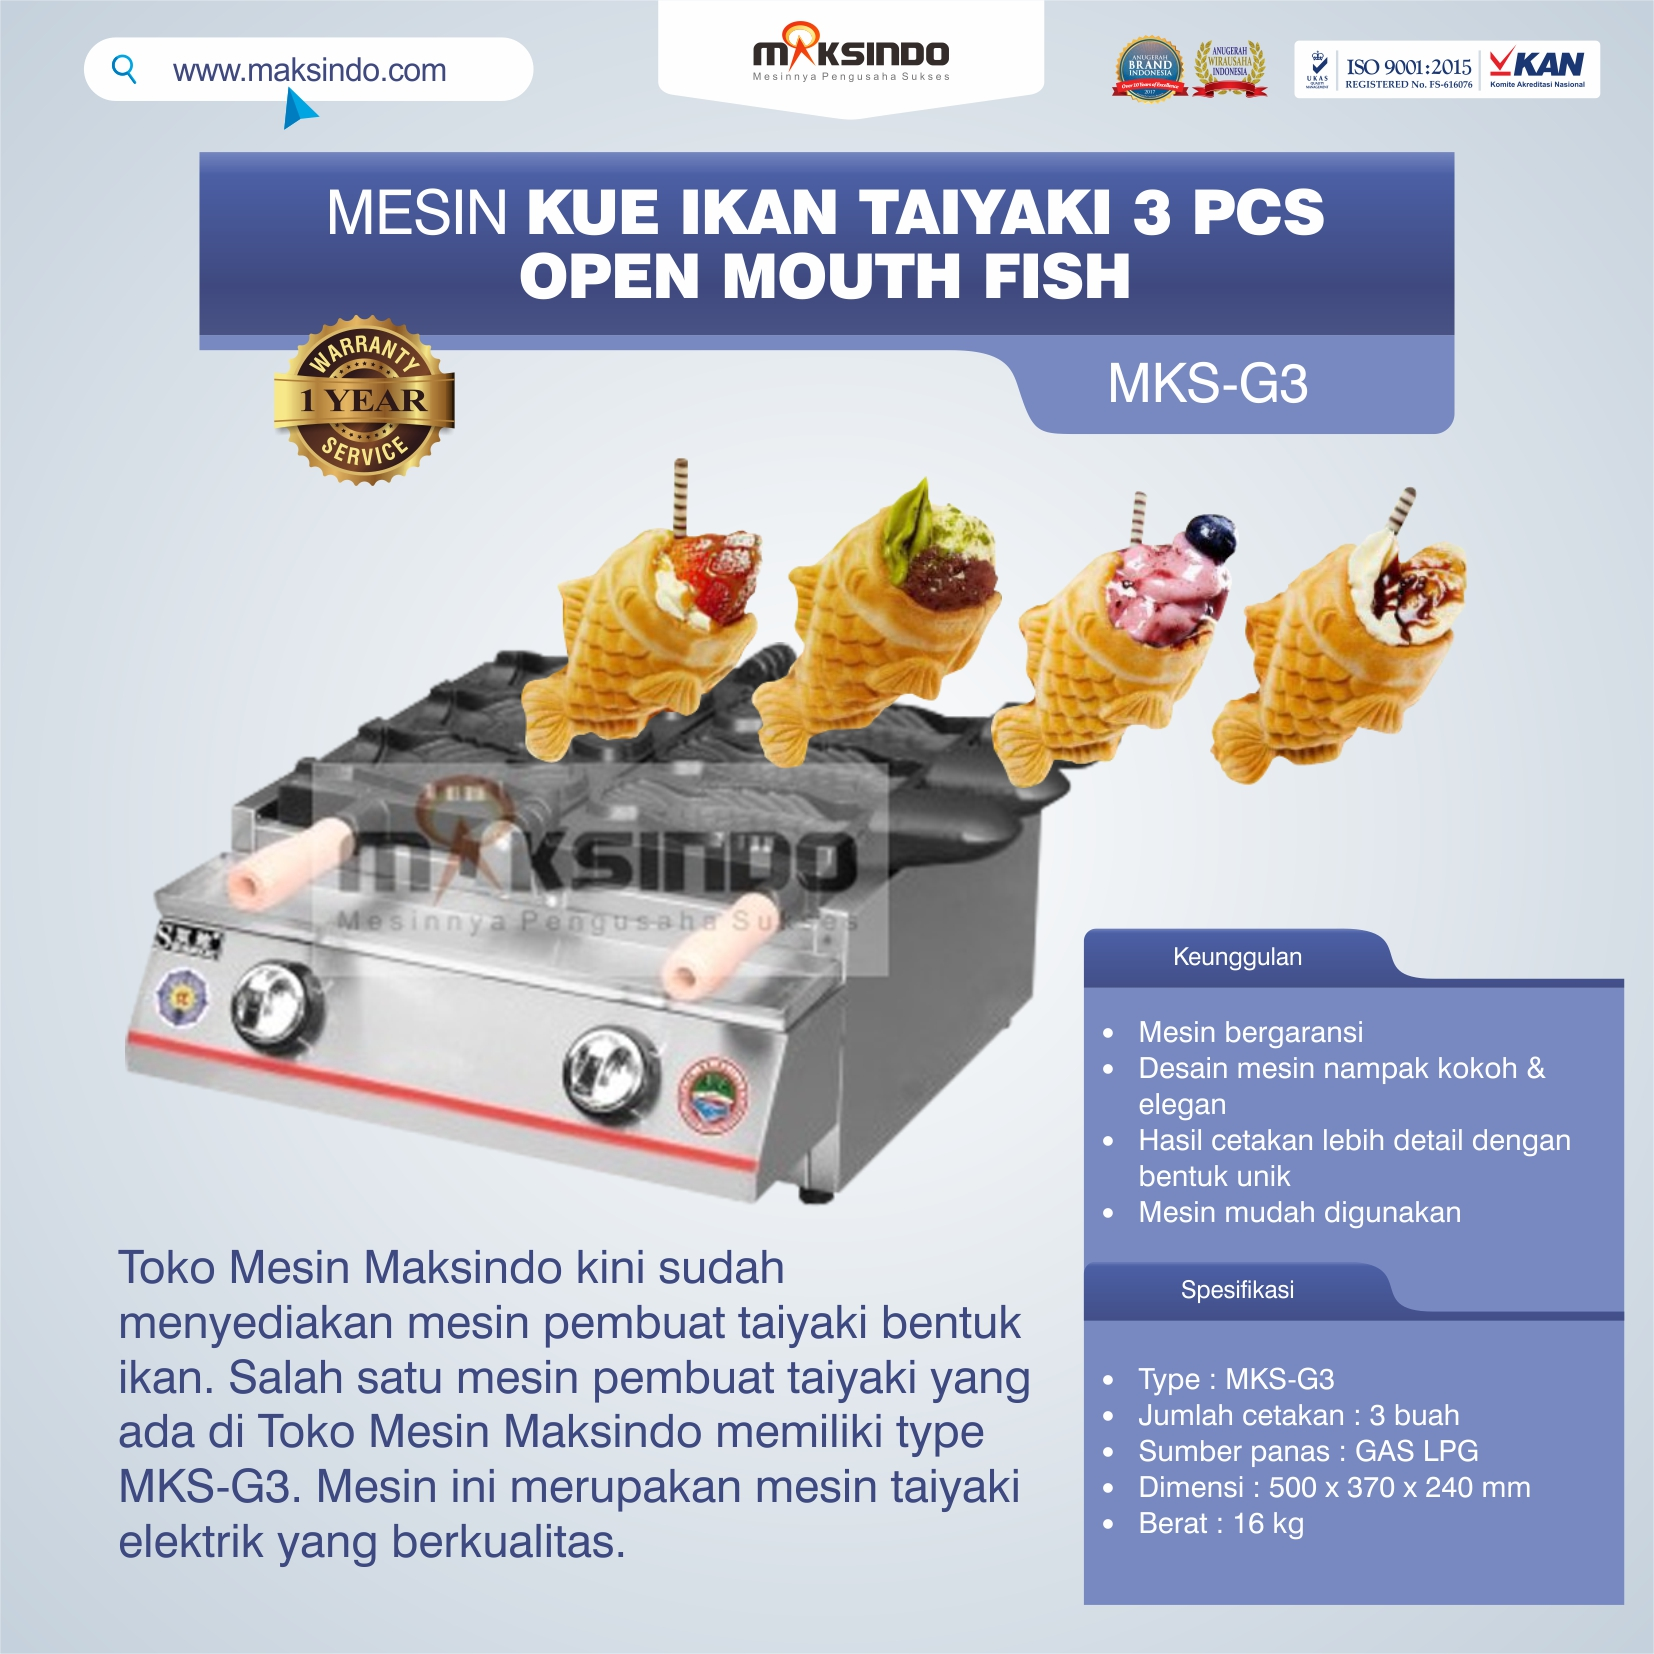 Jual Mesin Kue Ikan Taiyaki (3 pcs) – Open Mouth Fish di Tangerang